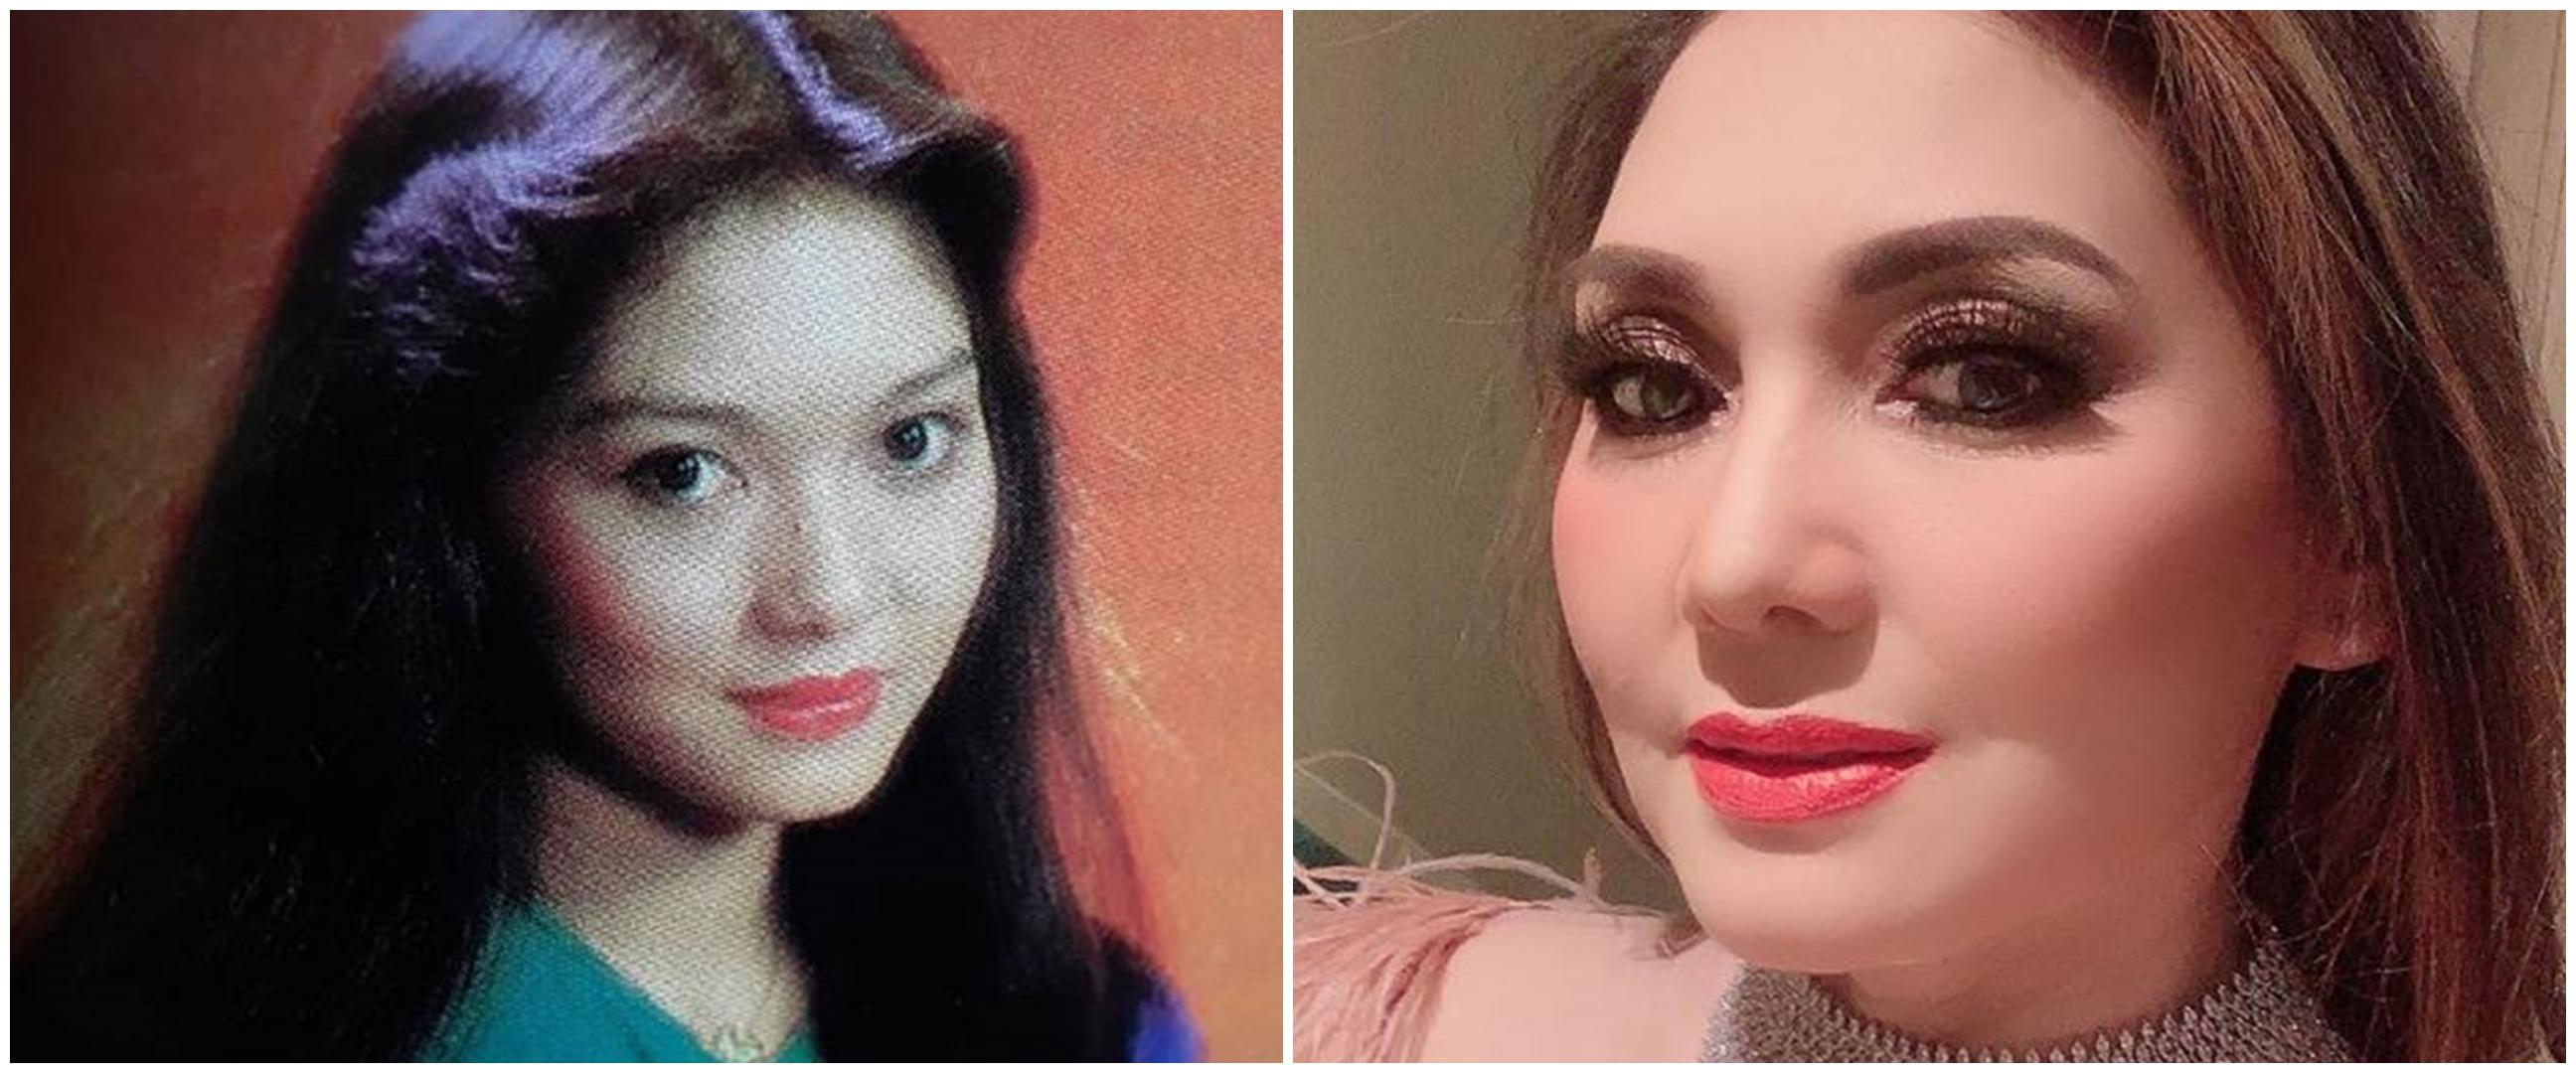 Potret 10 penyanyi cantik usia 50-an tahun di awal karier vs kini